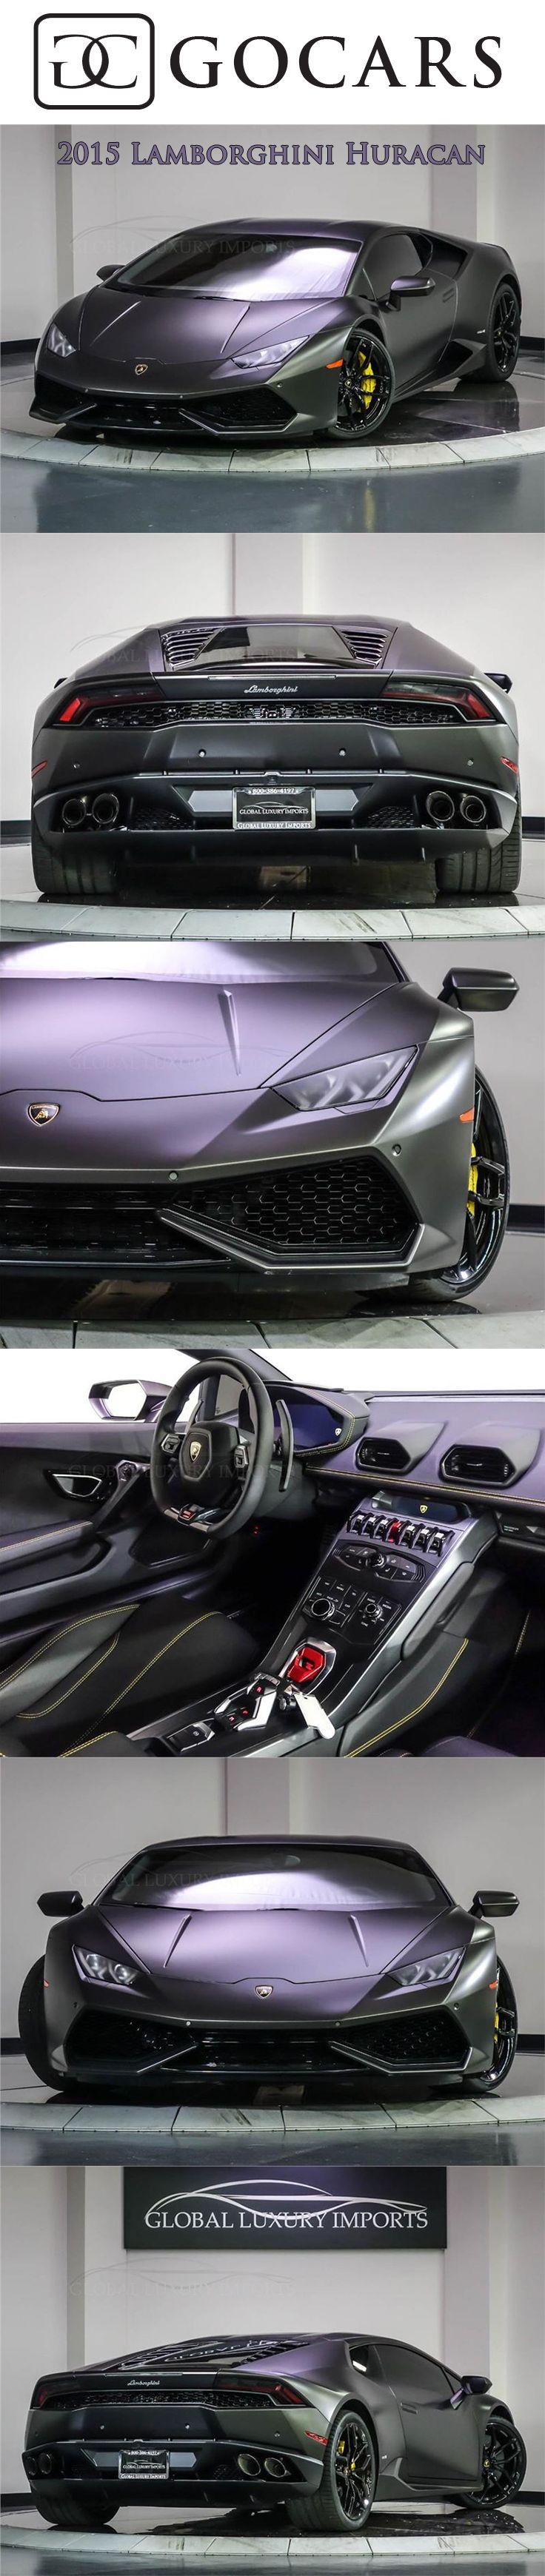 00a94a837ea2bfbc53db83ae8e62b738--lamborghini-huracan-sportscar Marvelous Lamborghini Huracan Hack asphalt 8 Cars Trend